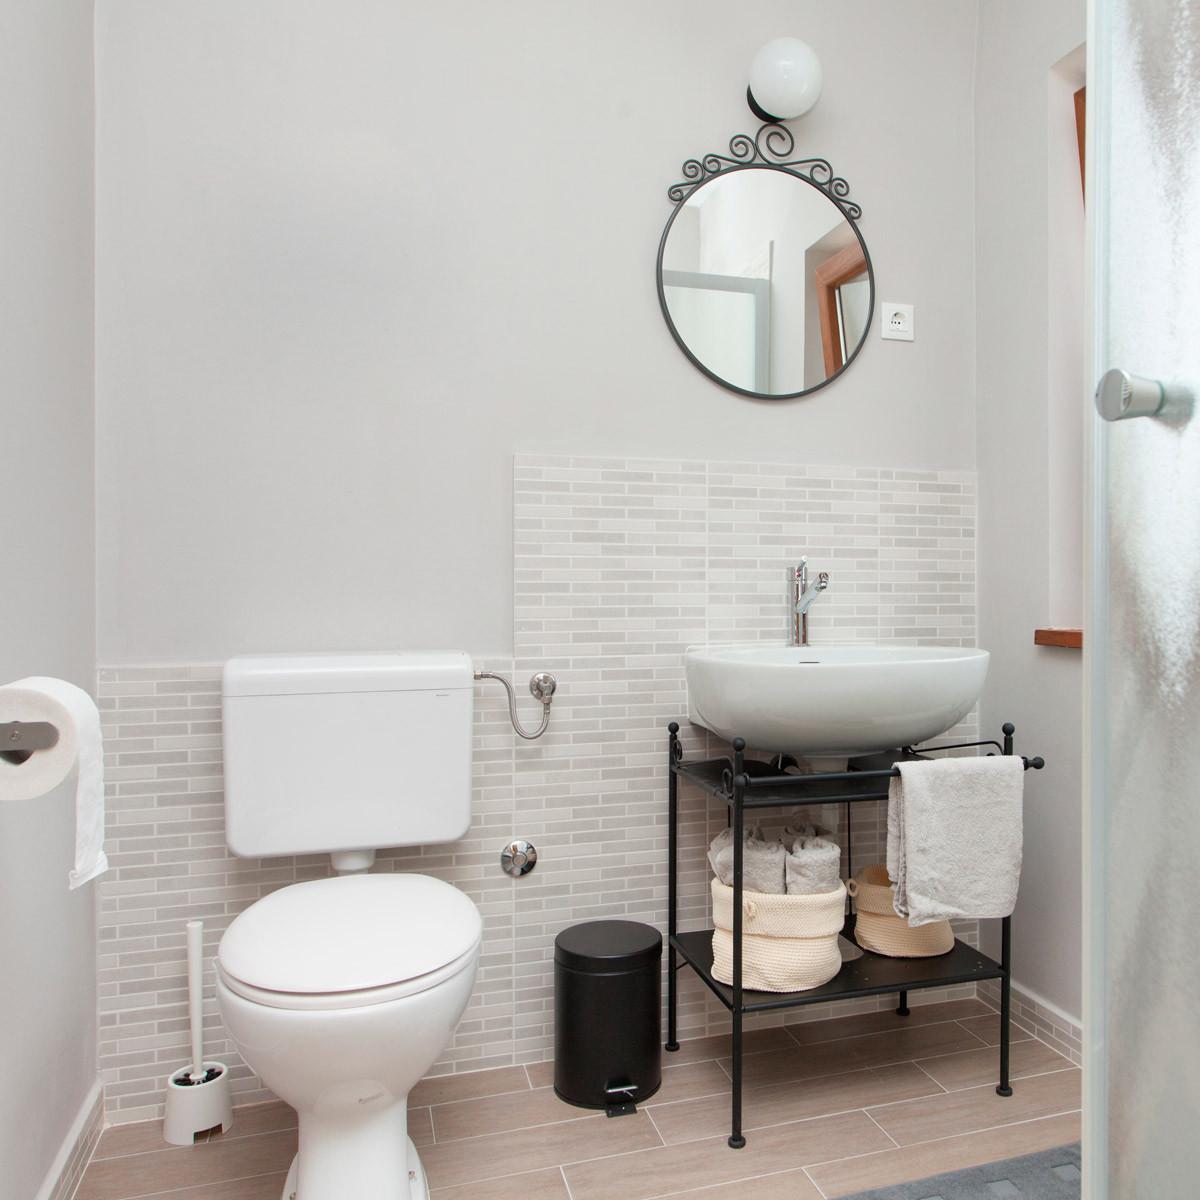 Bathroom Designs Small  10 Small Bathroom Ideas That Make a Big Impact